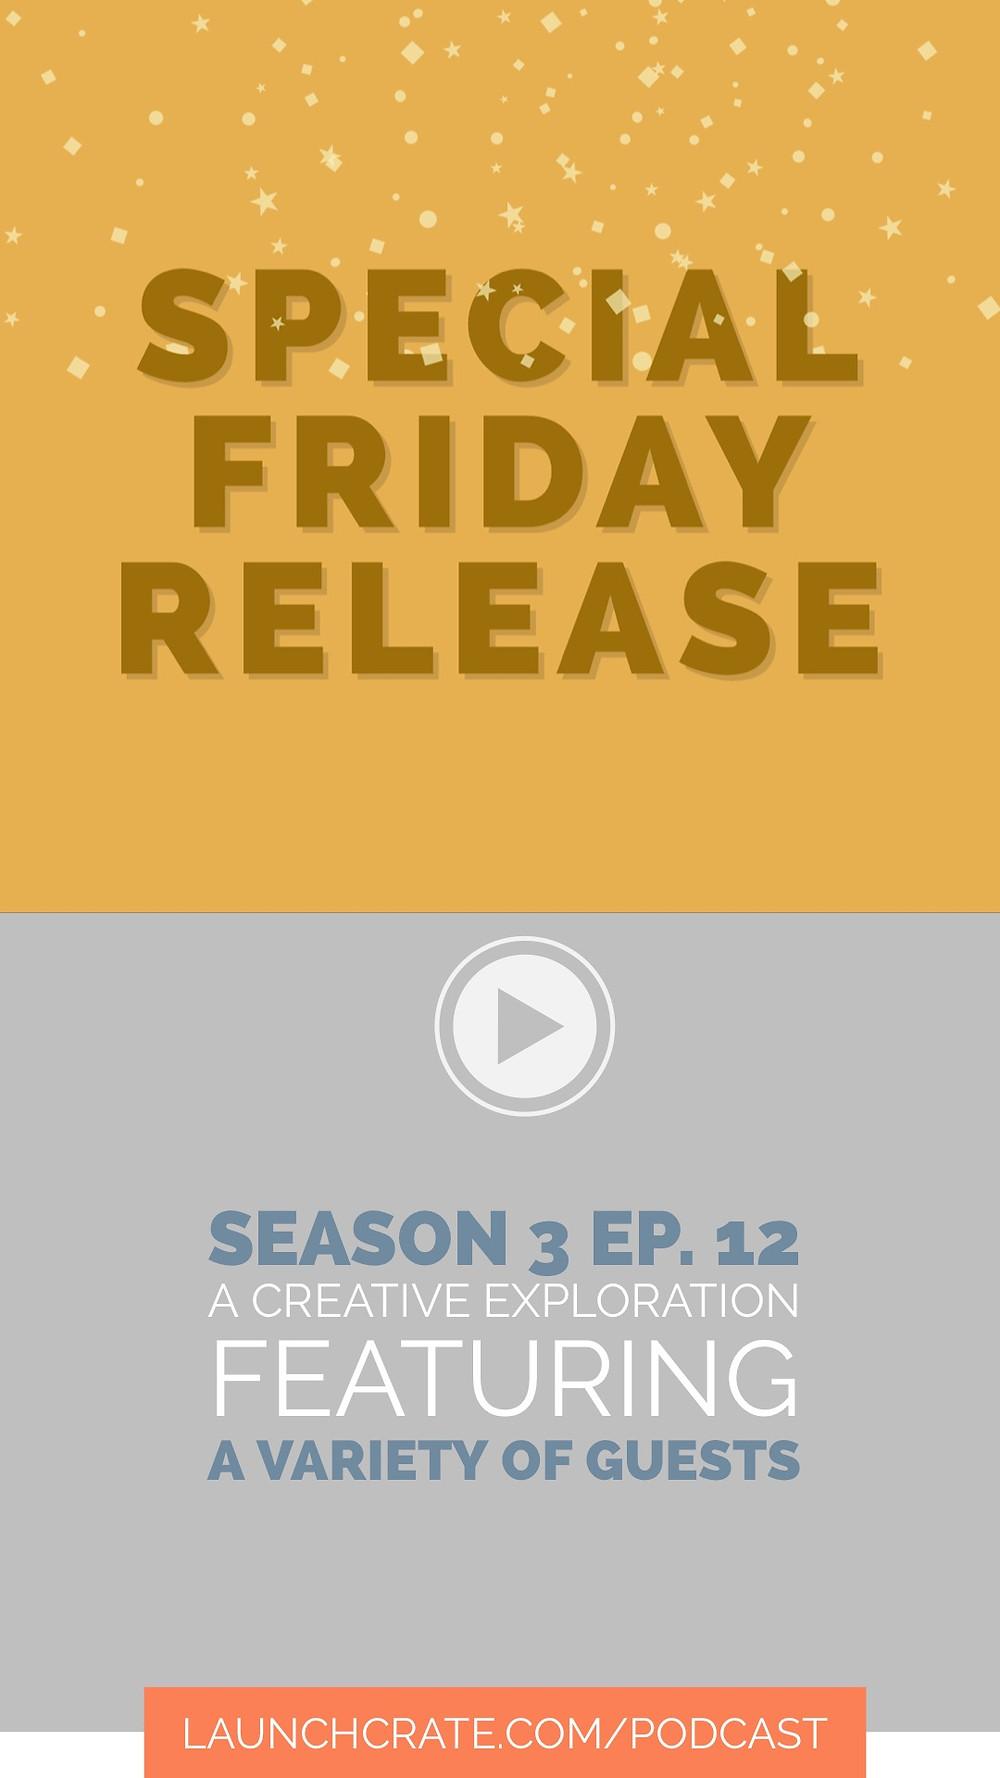 Podcast Season 3, Episode 12, with Wandering Stars a Plenty